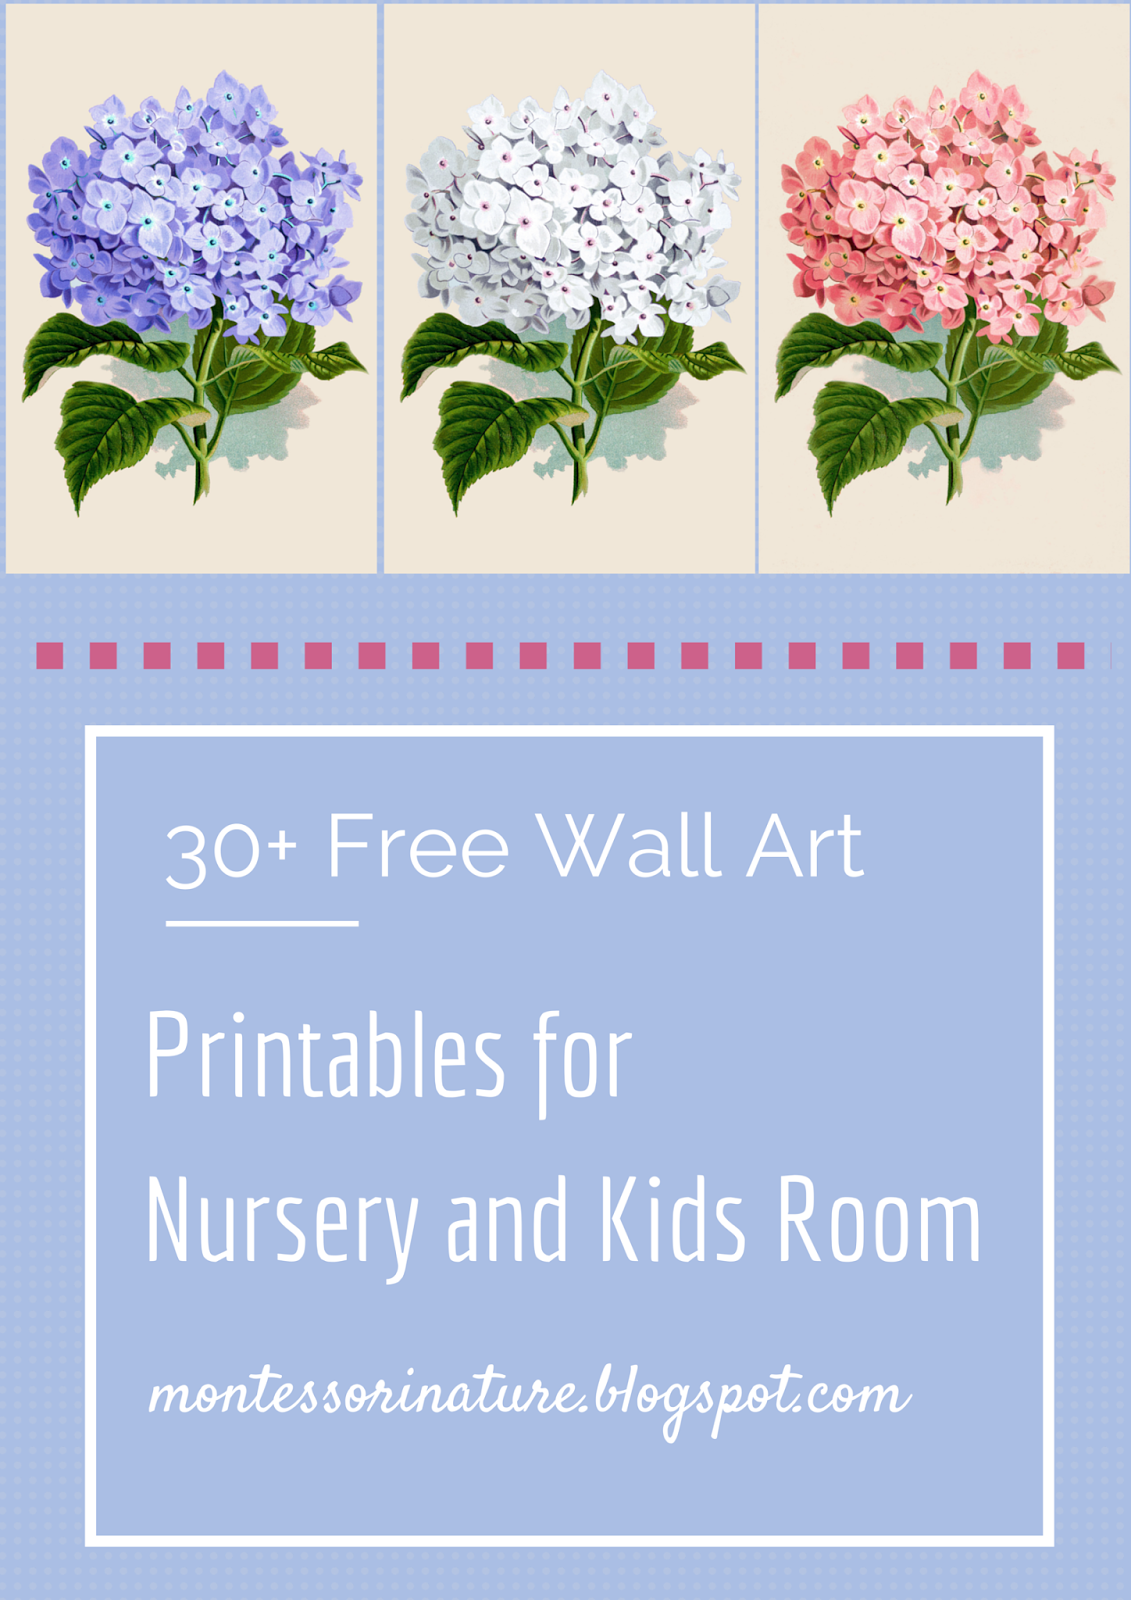 30+ Free Wall Art Printables for Nursery and Kids Room ...